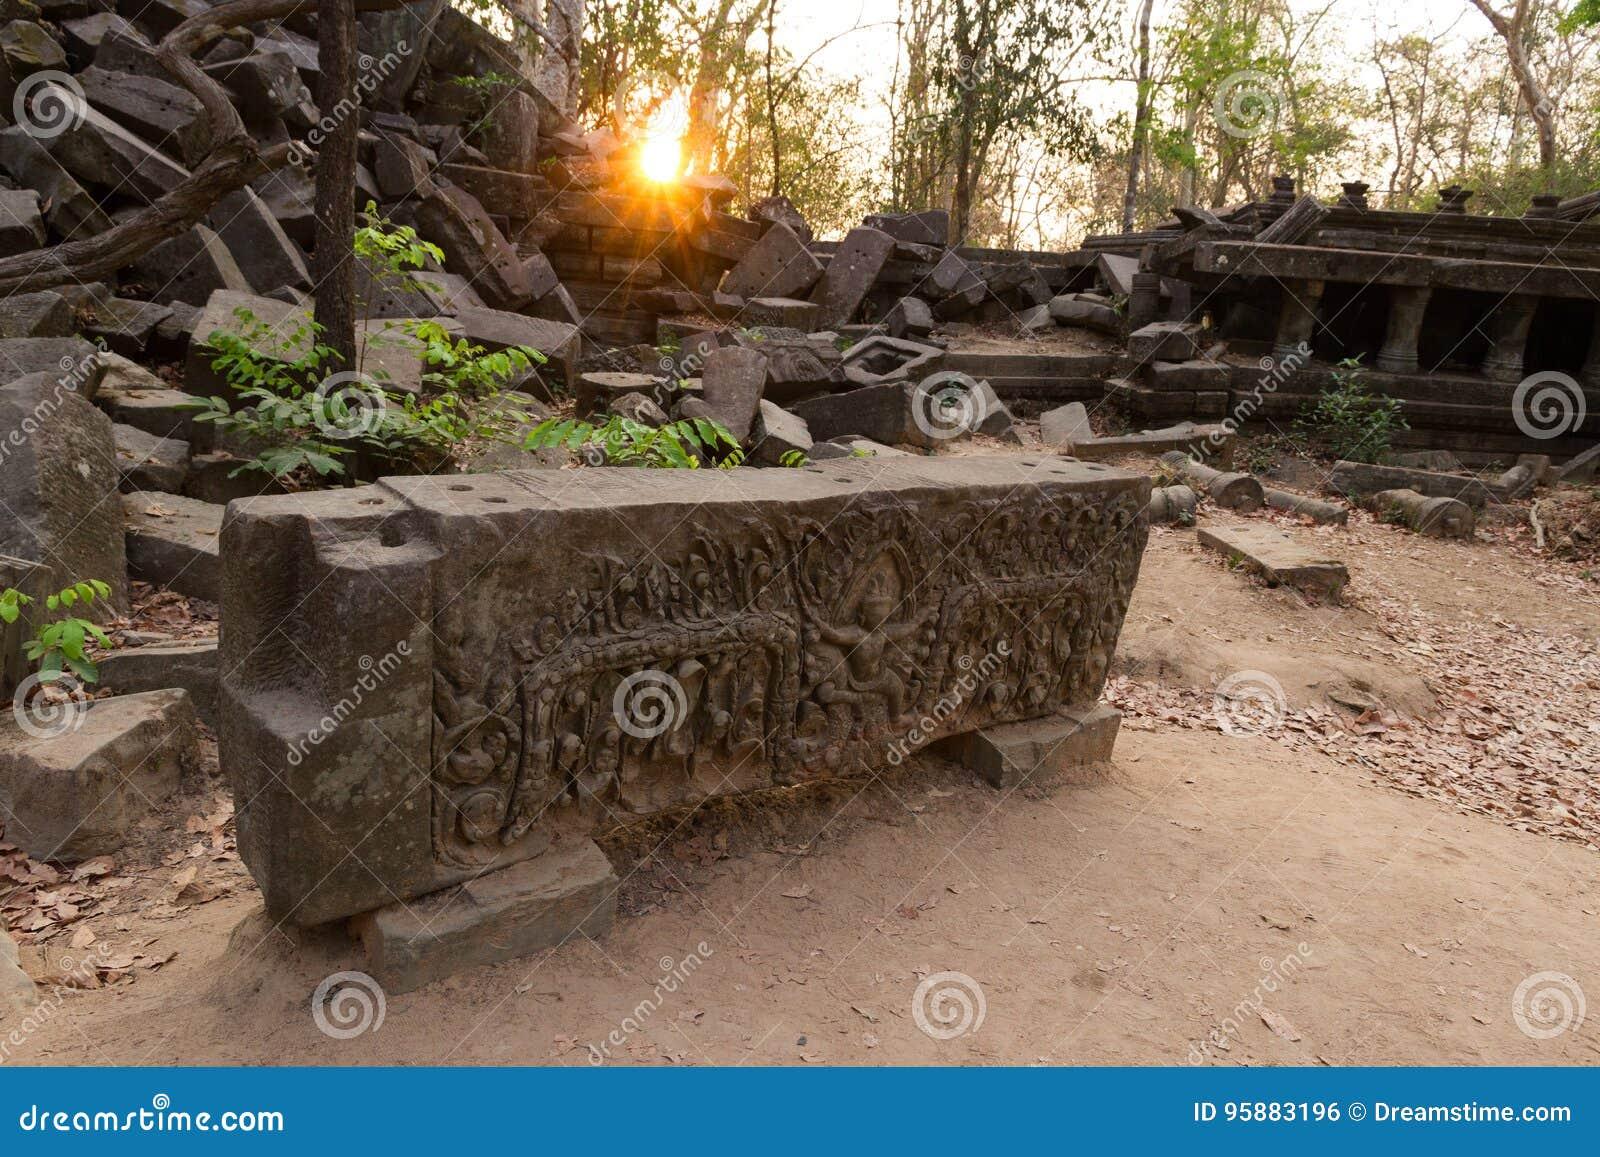 Świątynny Beng Mealea, Angkor Wat, Kambodża